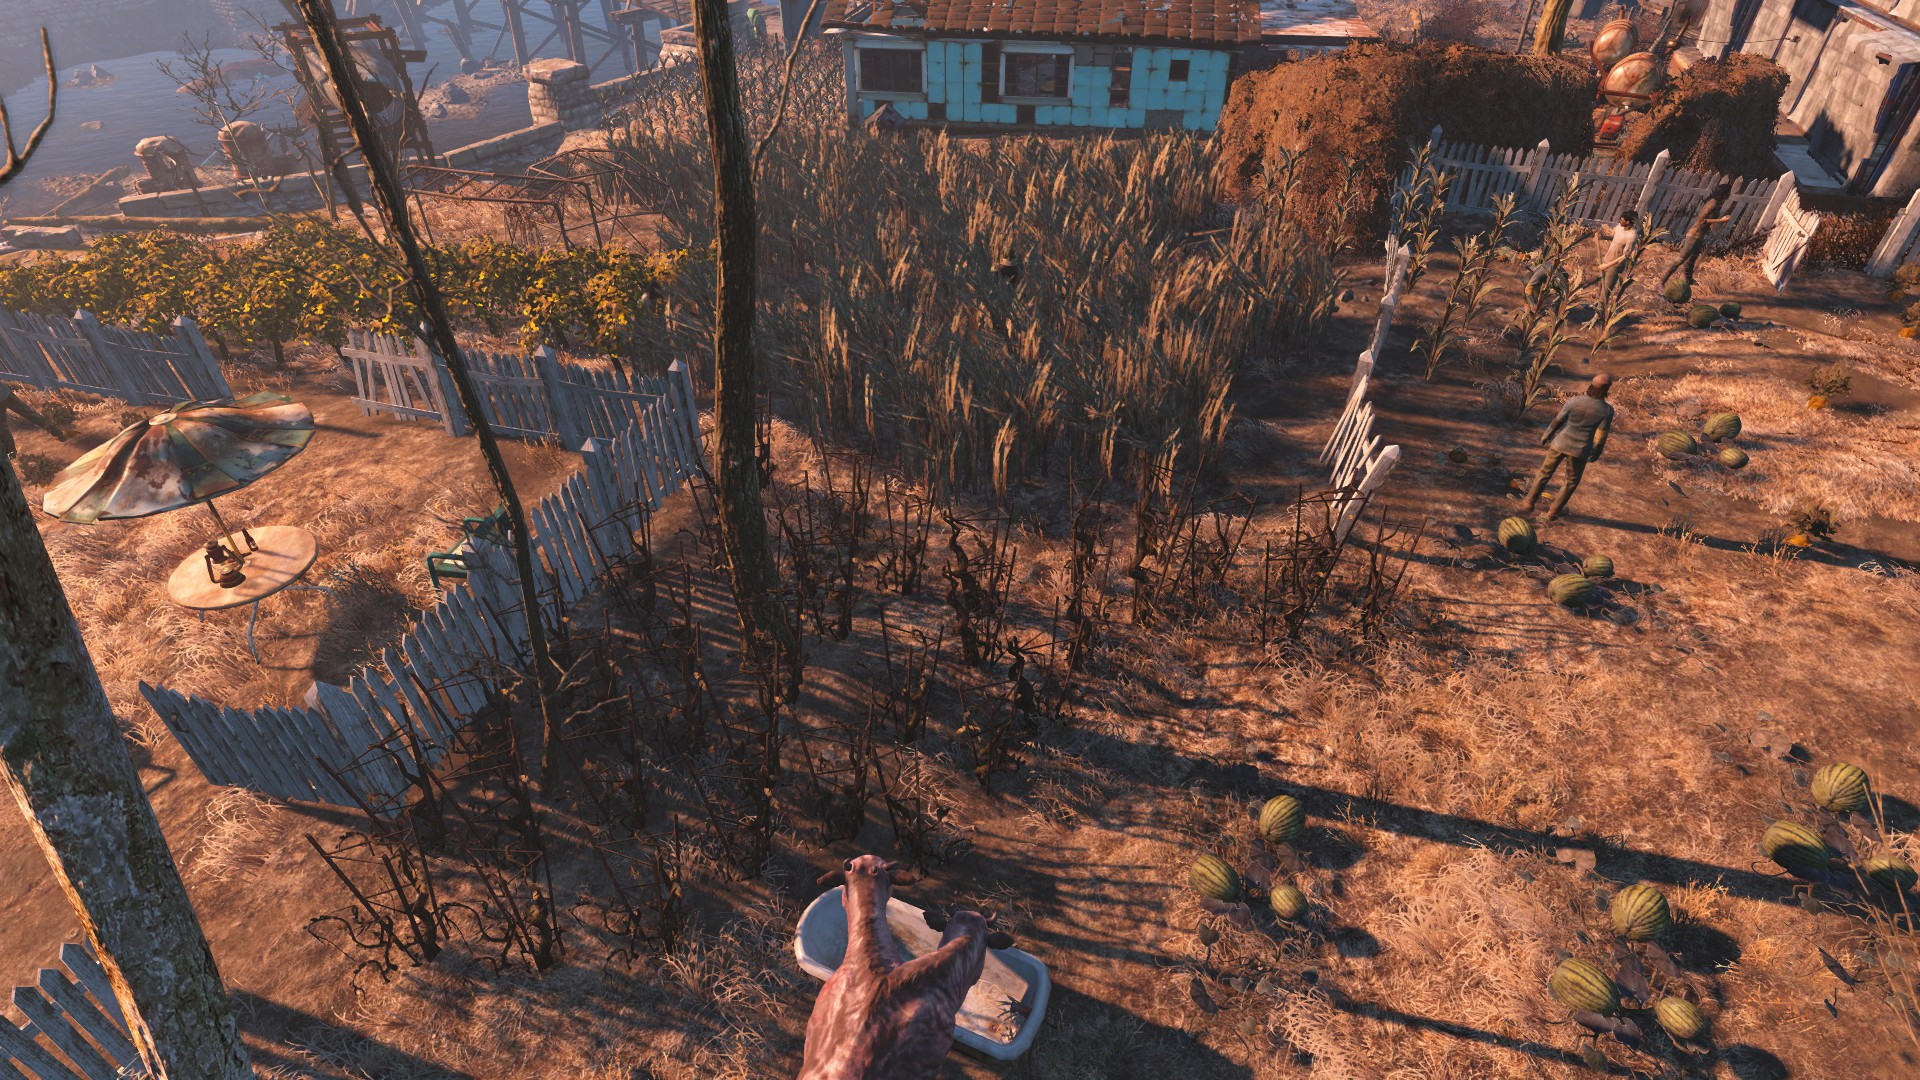 Corn Fallout 4  Fallout 4 Page 103 Gaming GTAForums